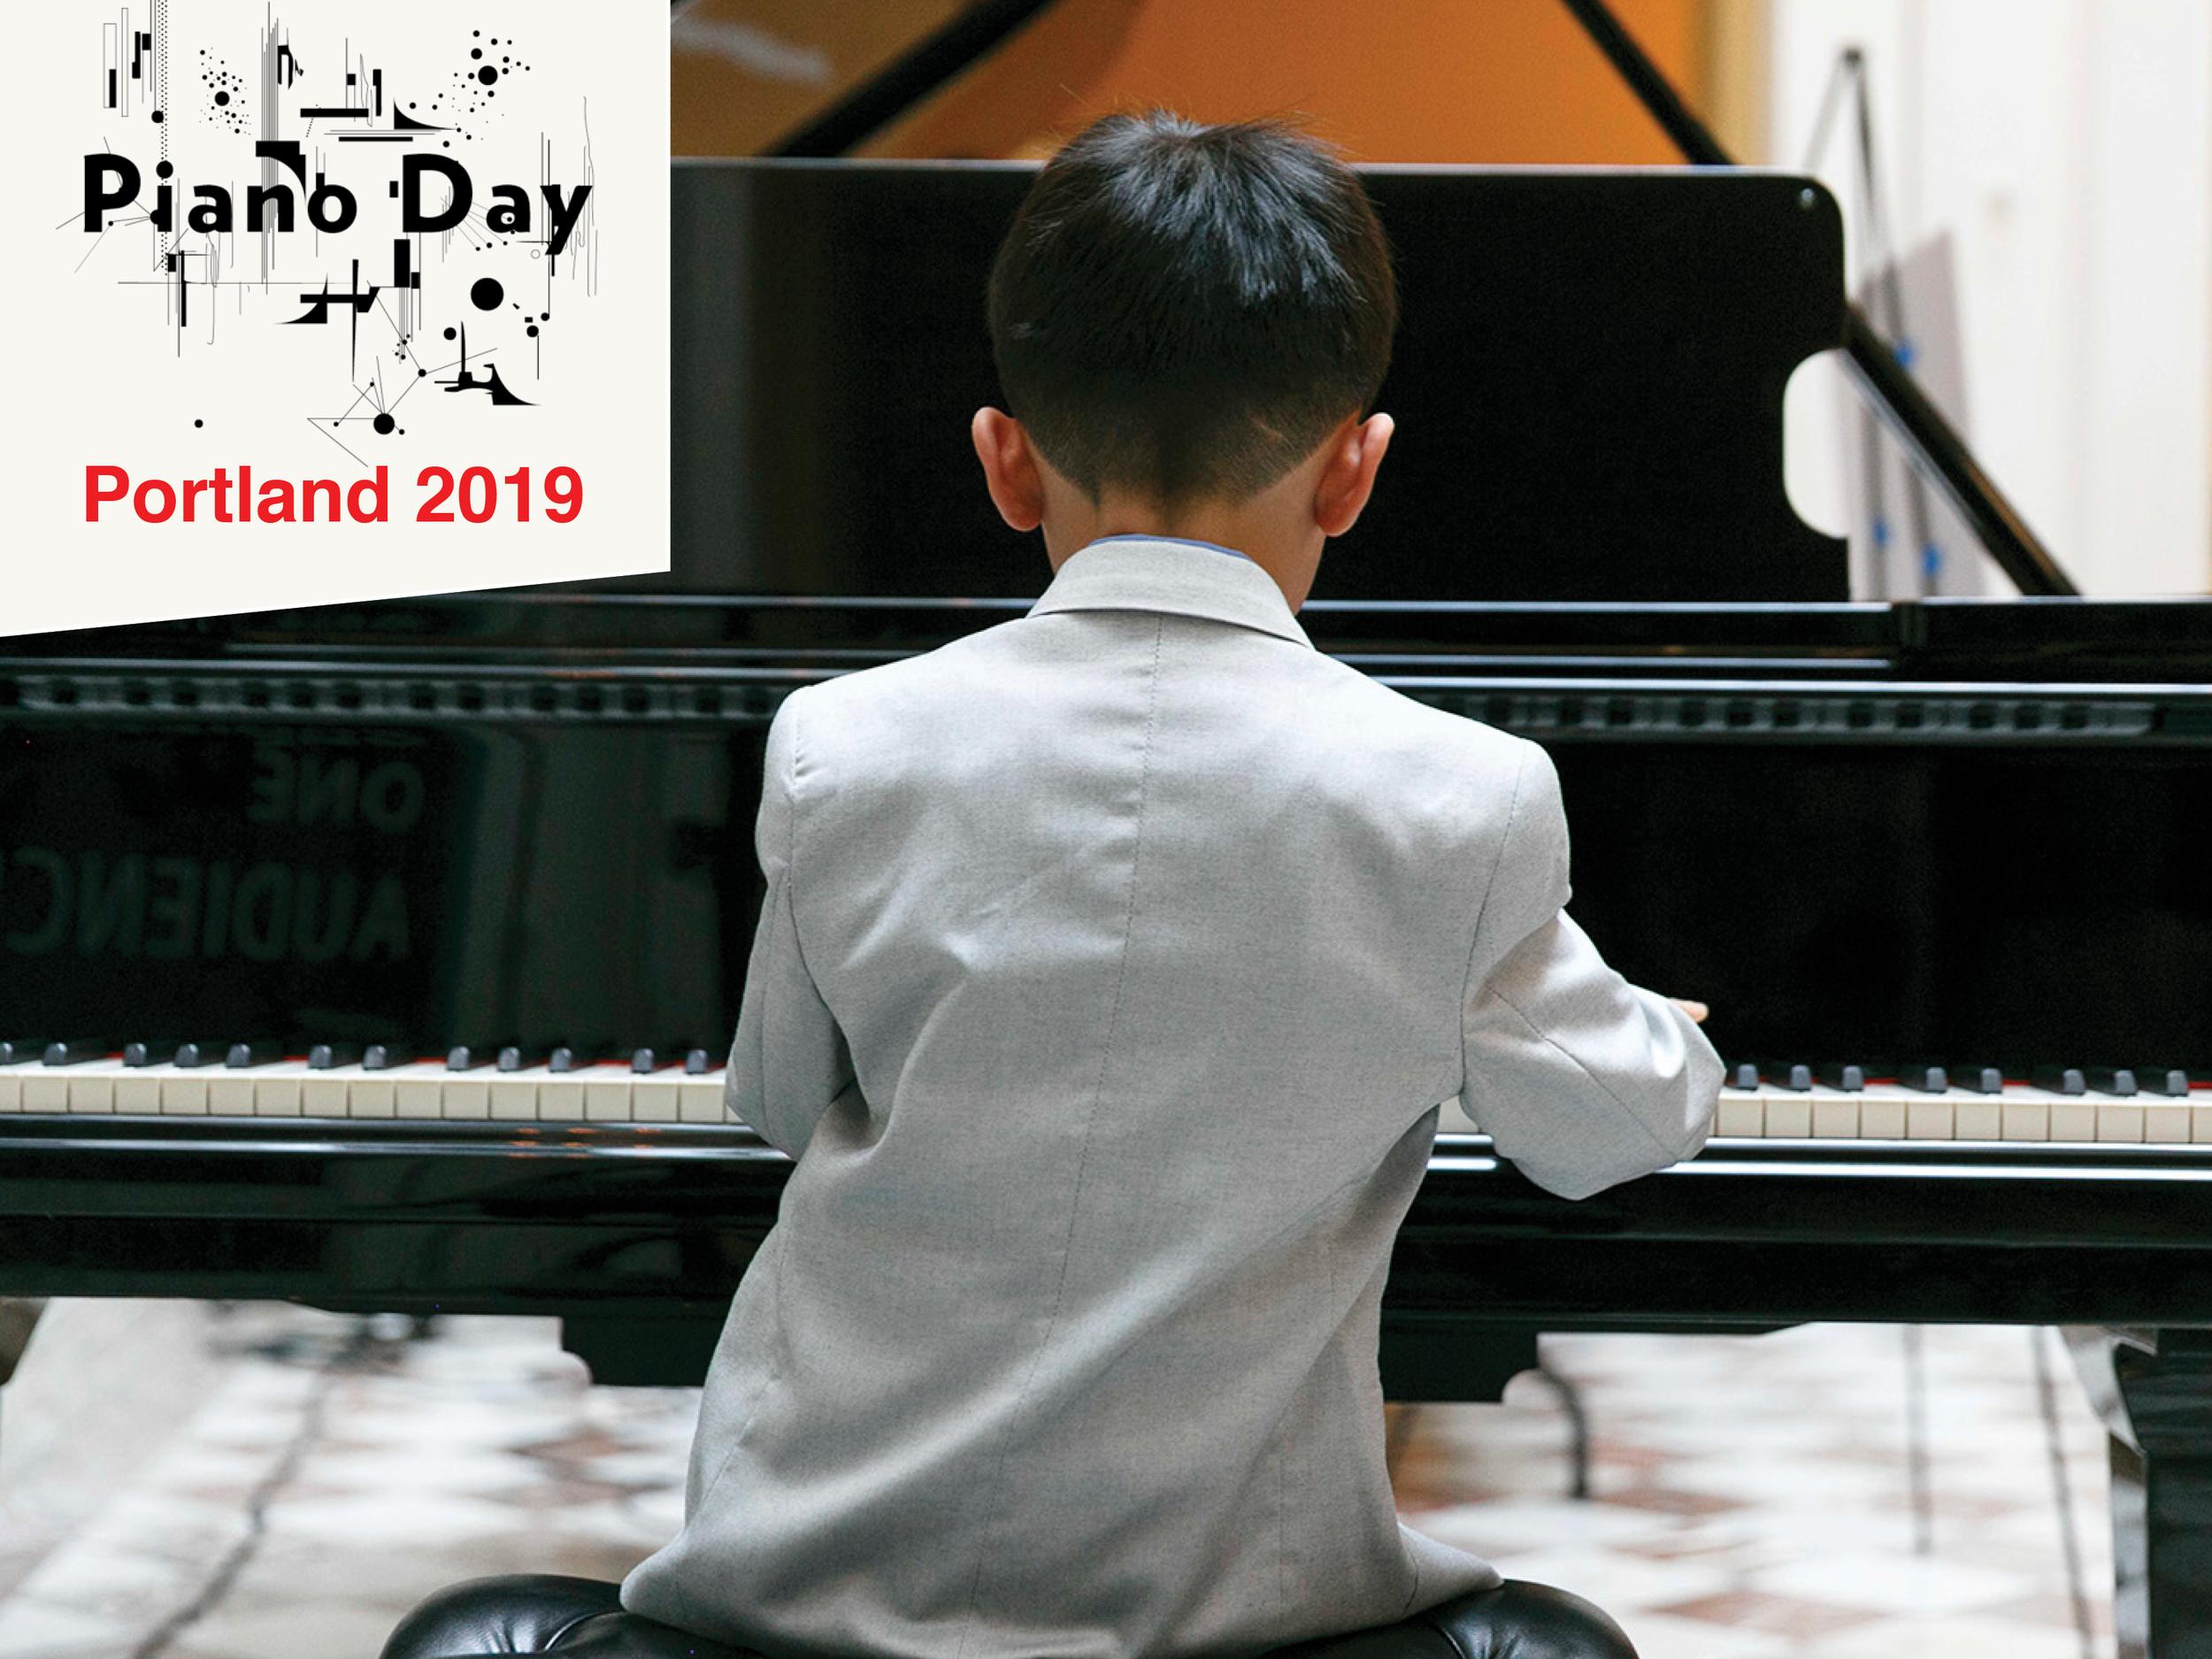 Piano Day 2019